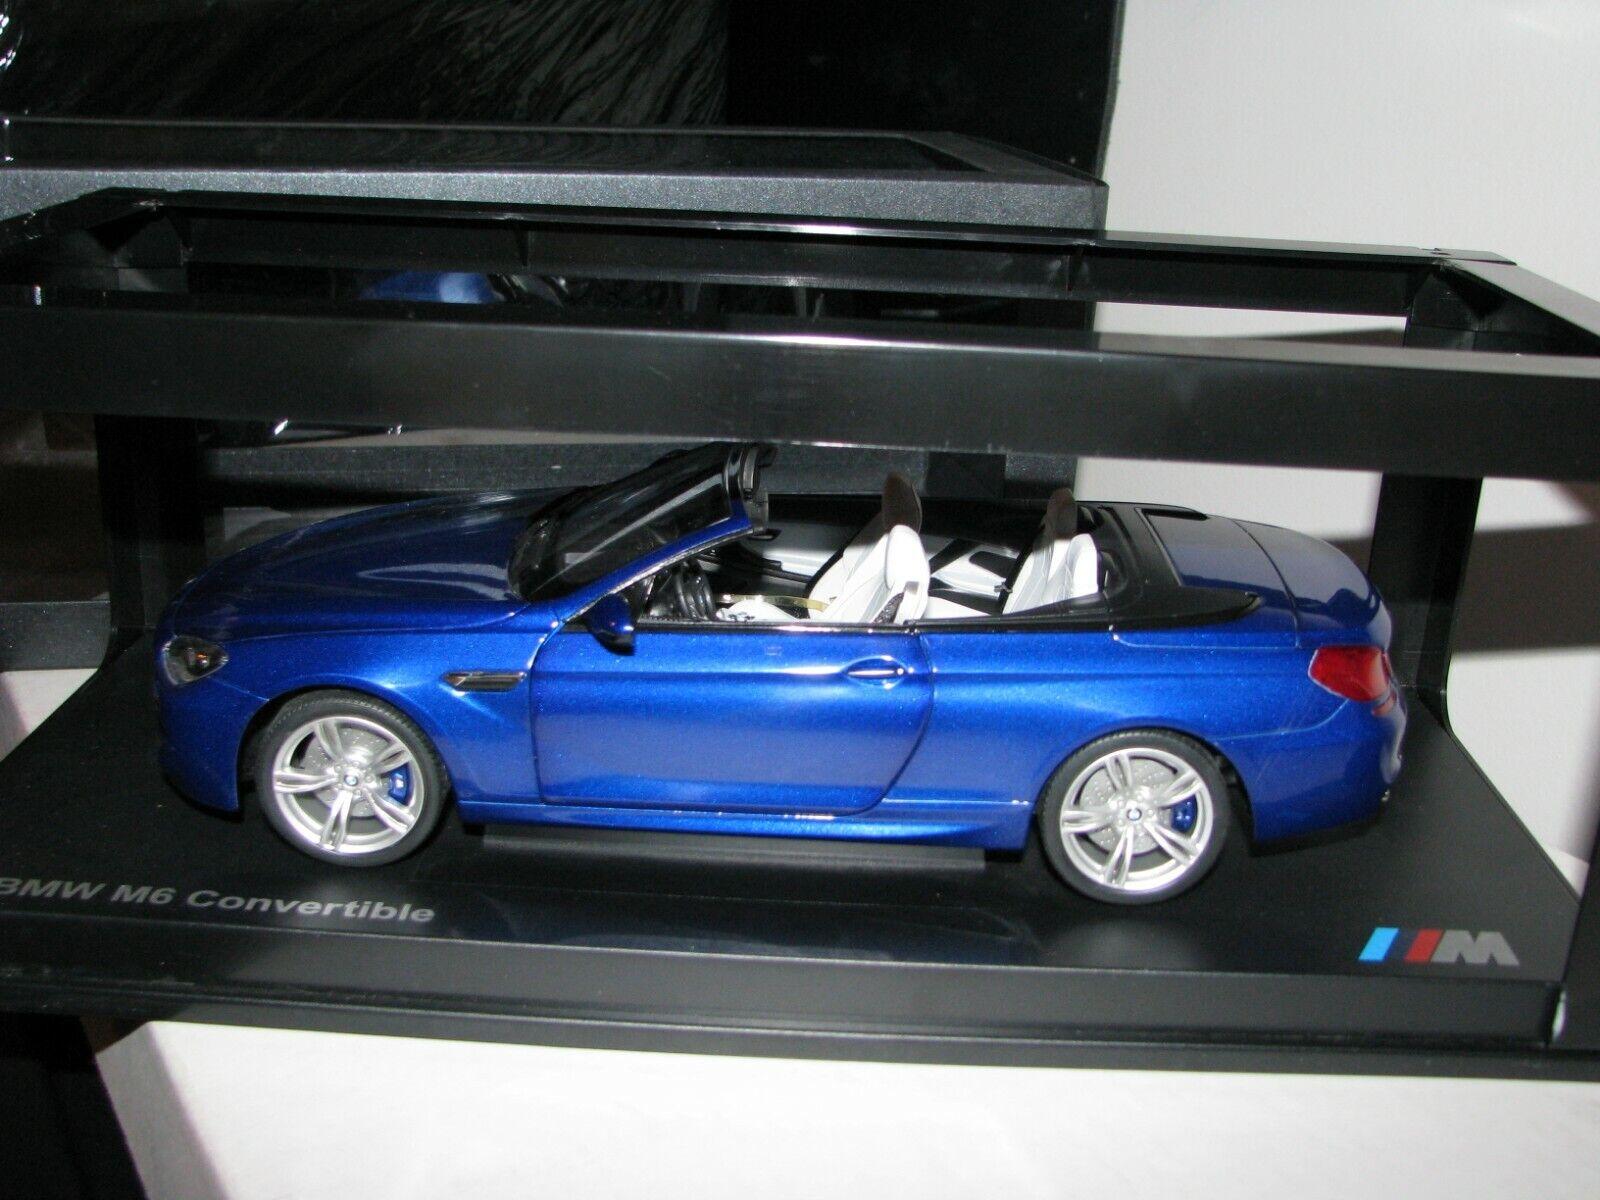 Paragon BMW M6 Converdeible 1 18 edición del Distribuidor San Marino blu